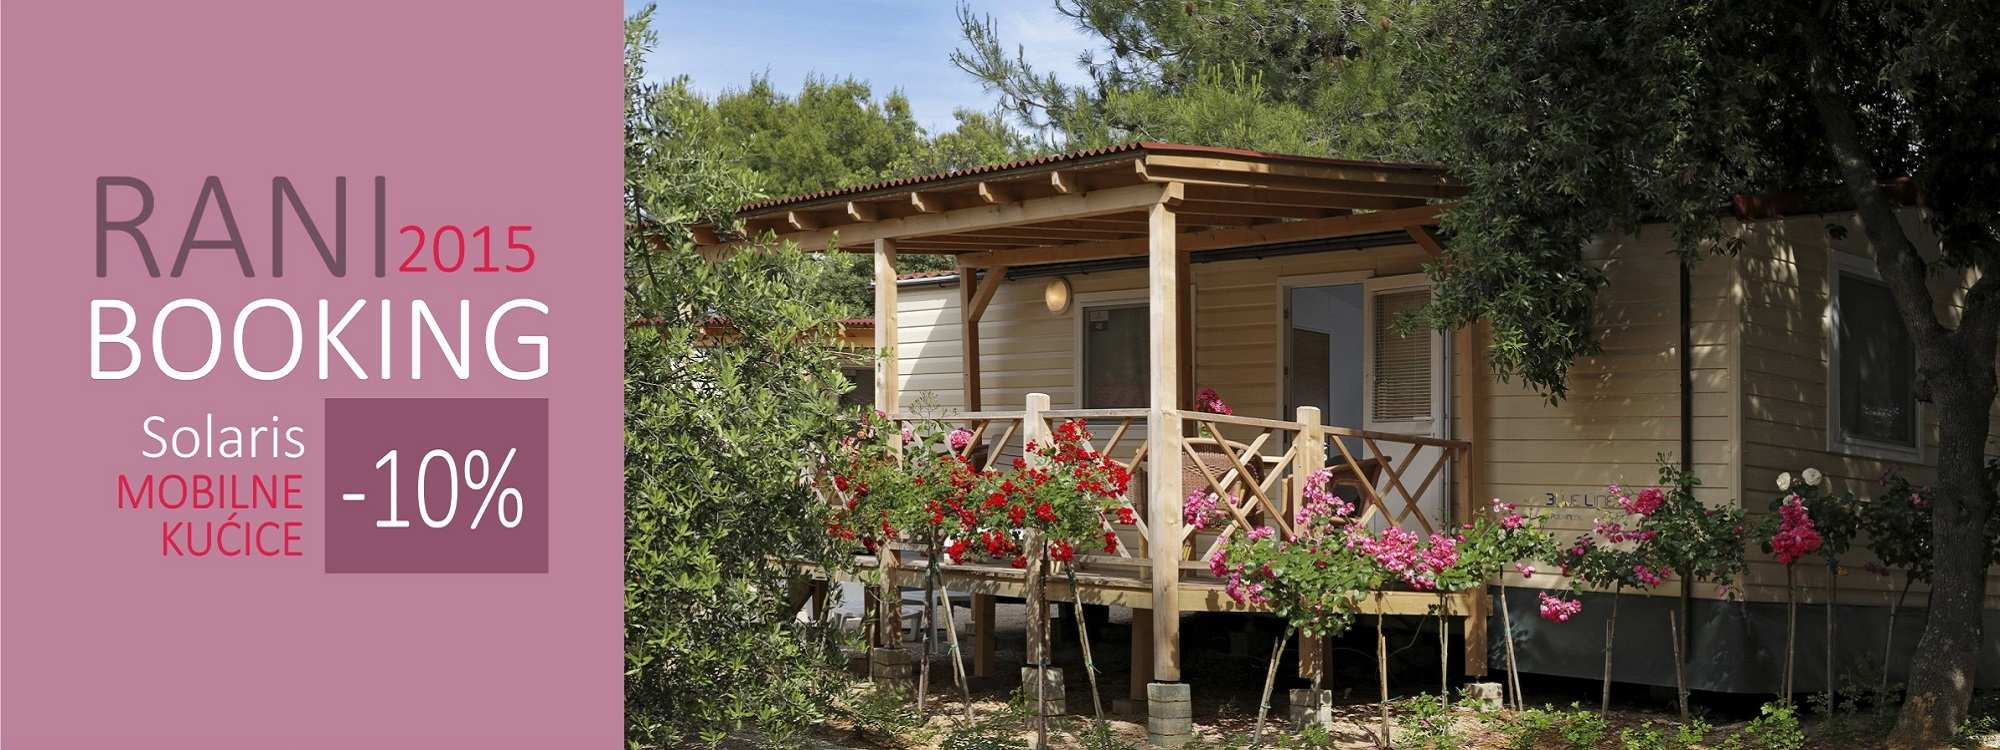 Rani_booking_mobilne_kucice_solaris_camping_beach_resort_posebna_ponuda_hrvatska